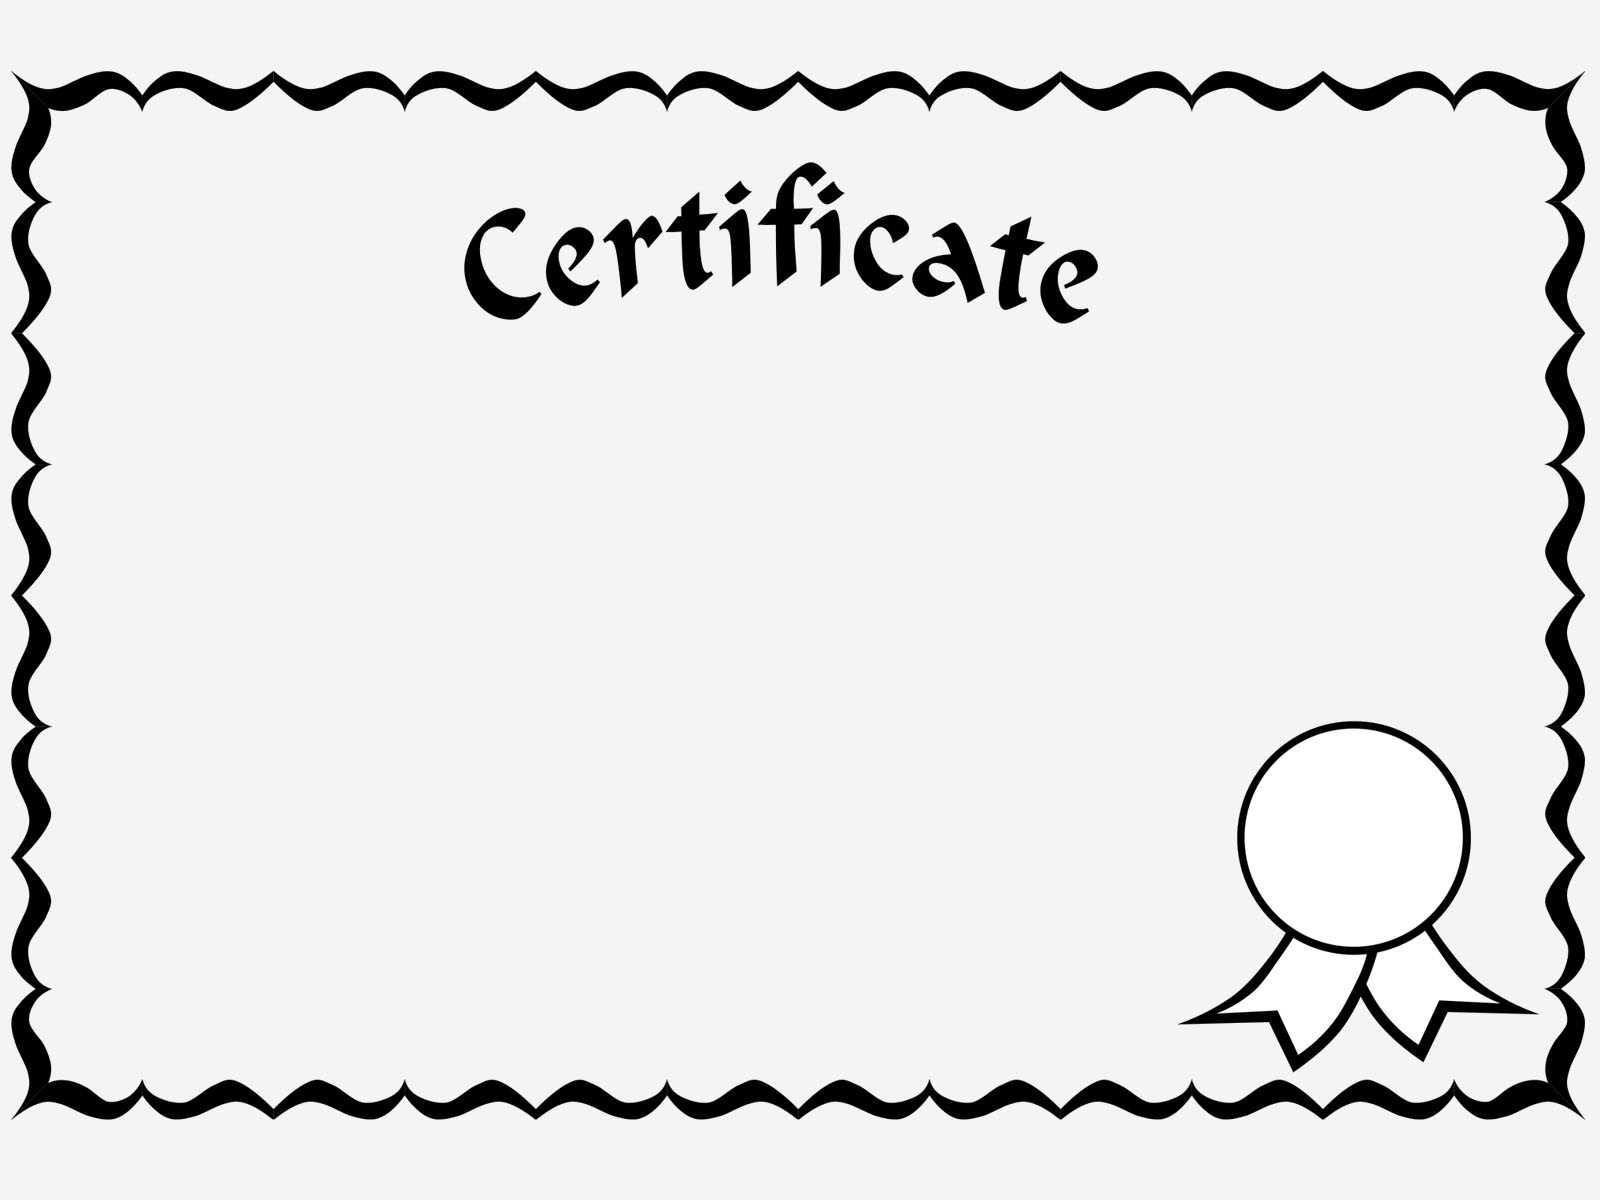 Graduation clipart diploma frame #2